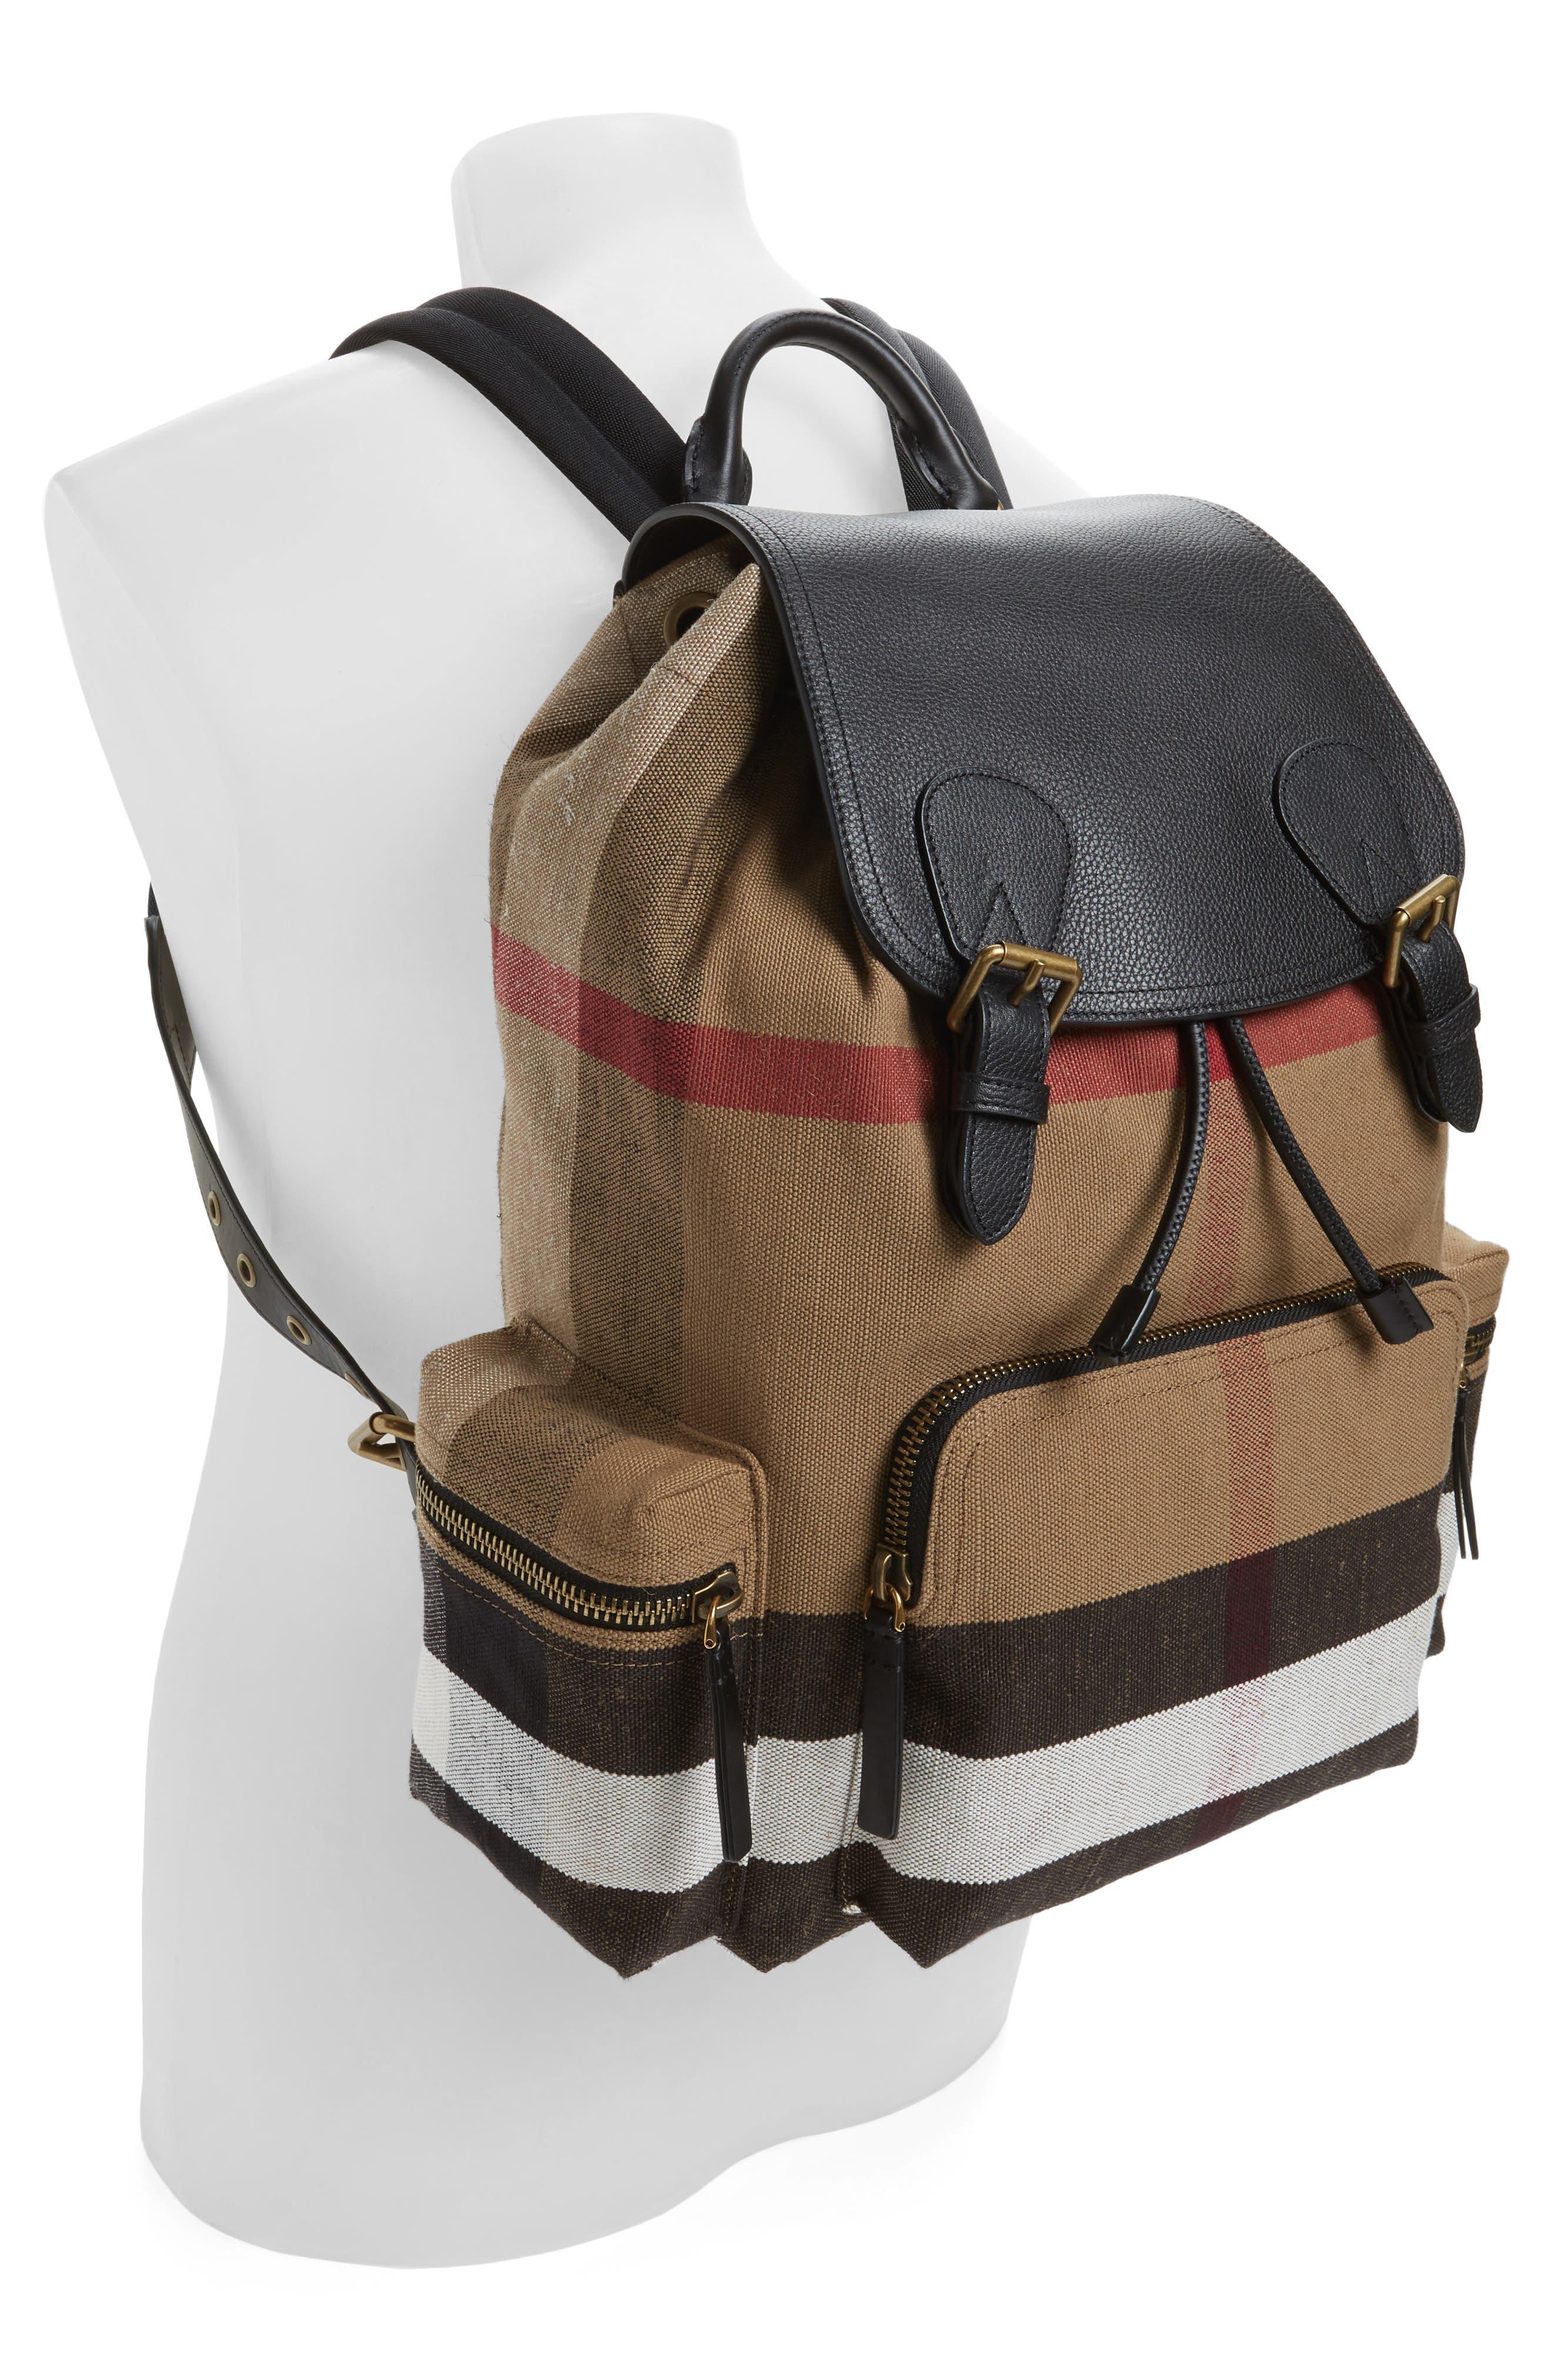 Rucksack Backpack,                             Alternate thumbnail 2, color,                             230